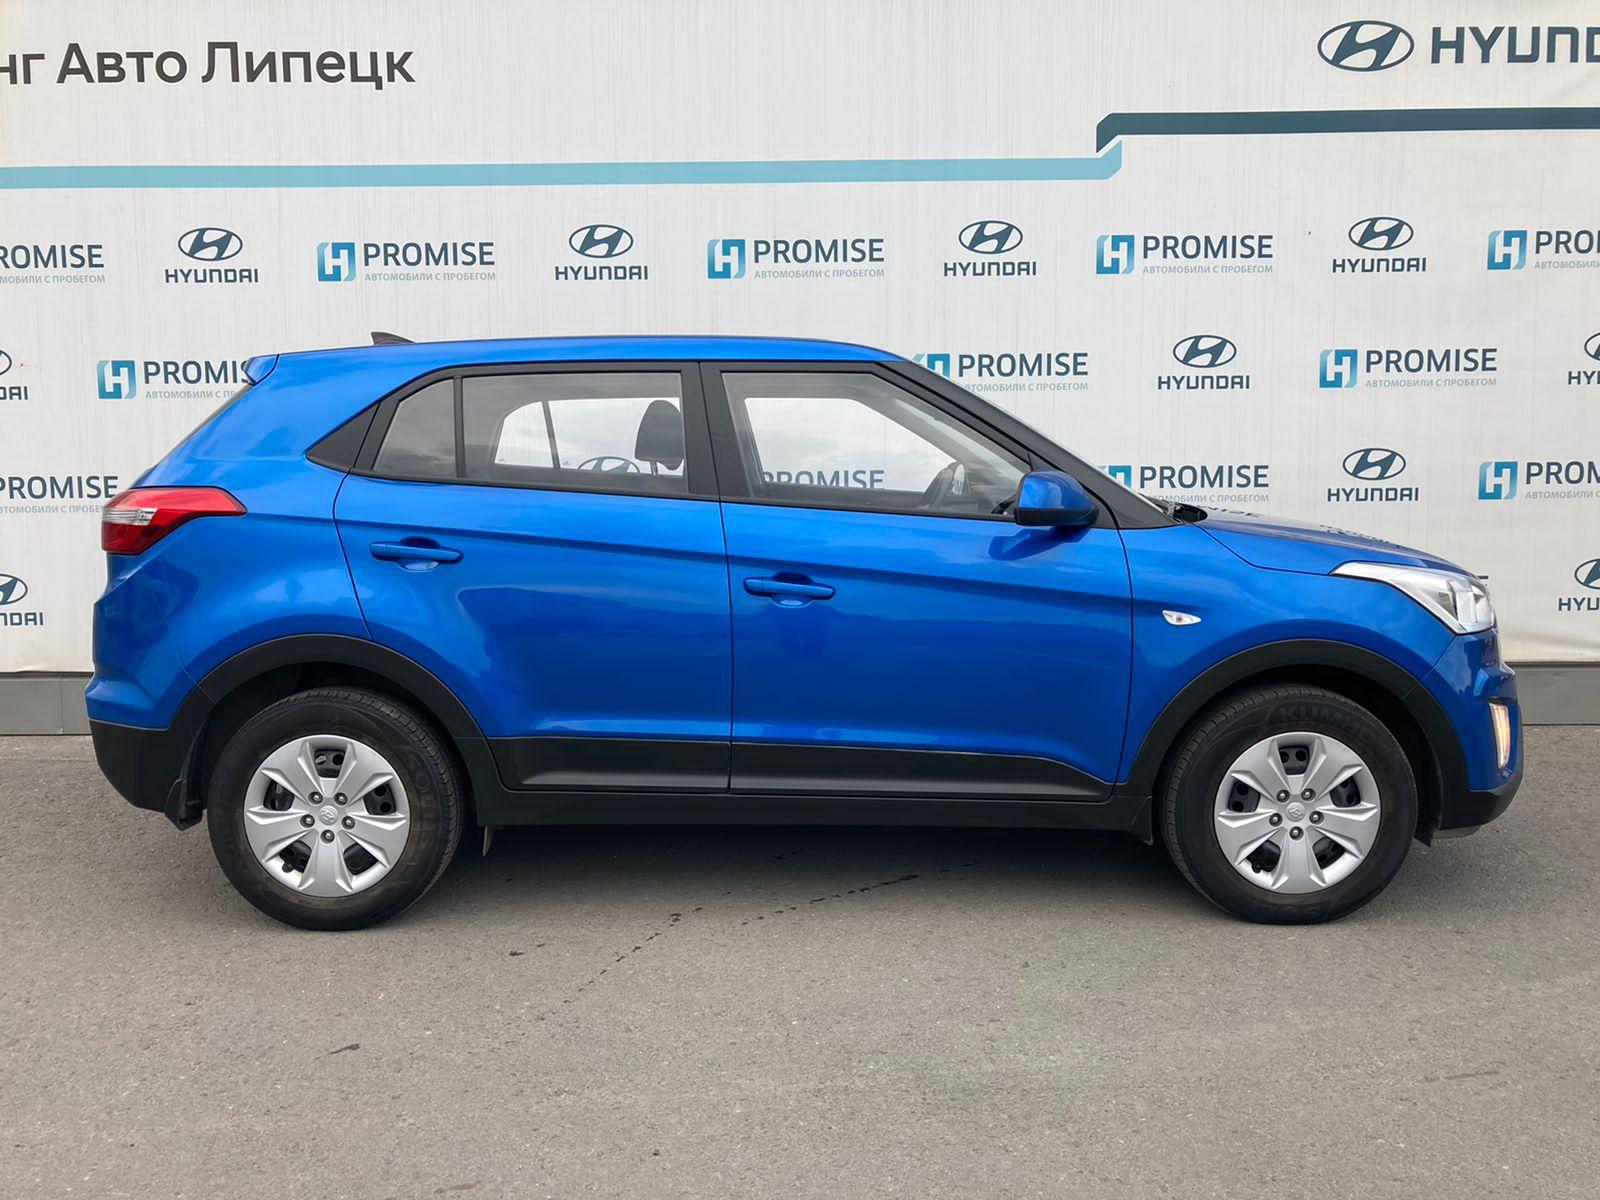 Hyundai Creta Внедорожник (2018г.)